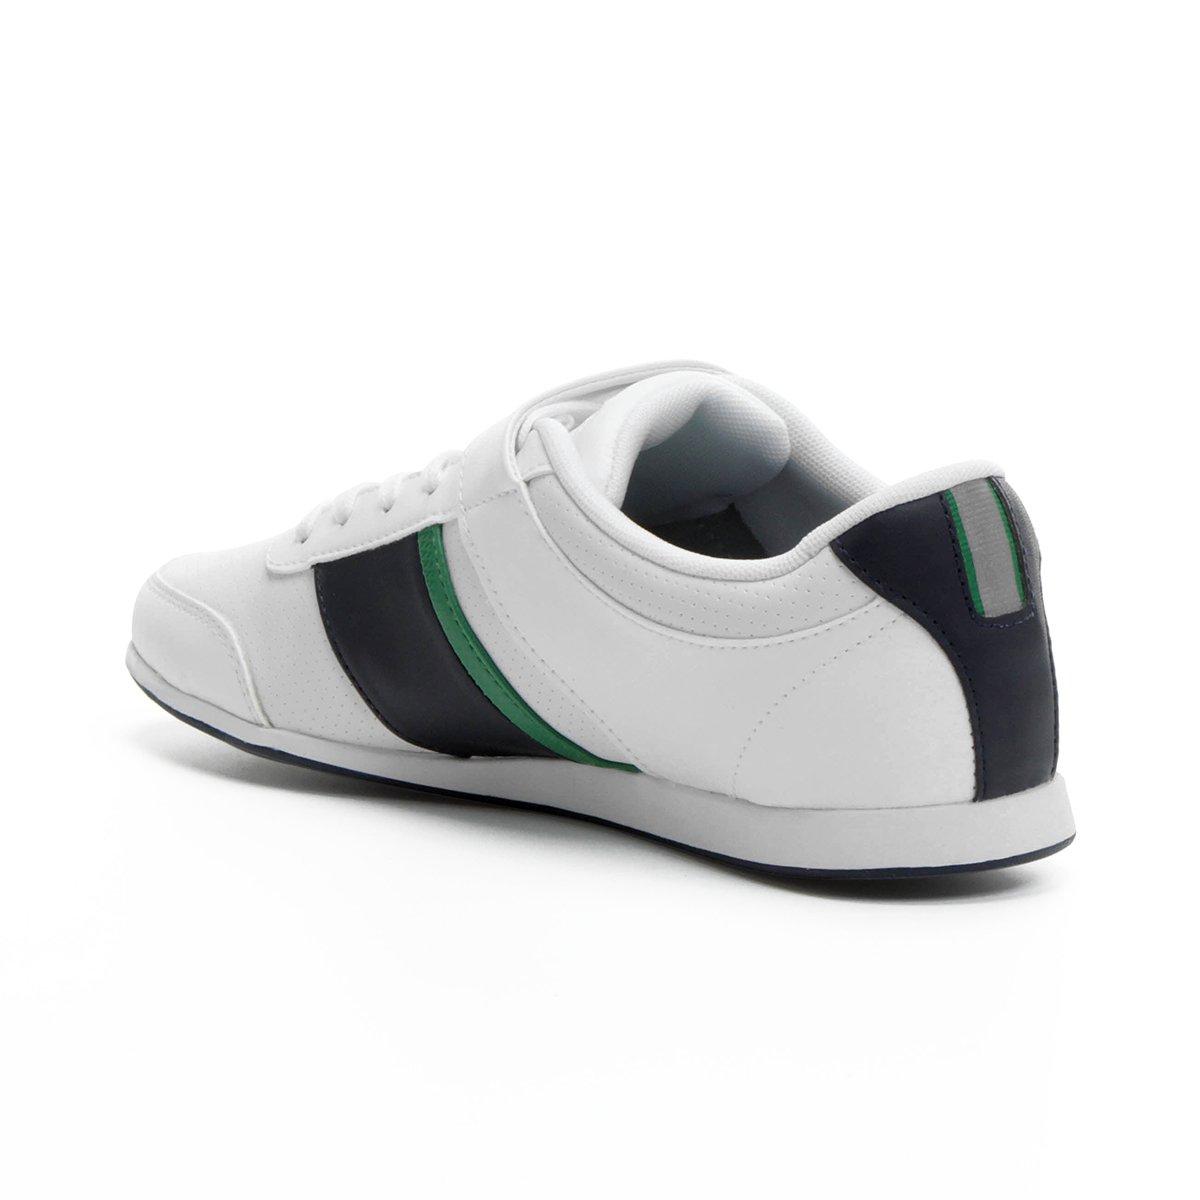 3c920ad880279 Tênis Lacoste Embrun Scy - Compre Agora   Netshoes